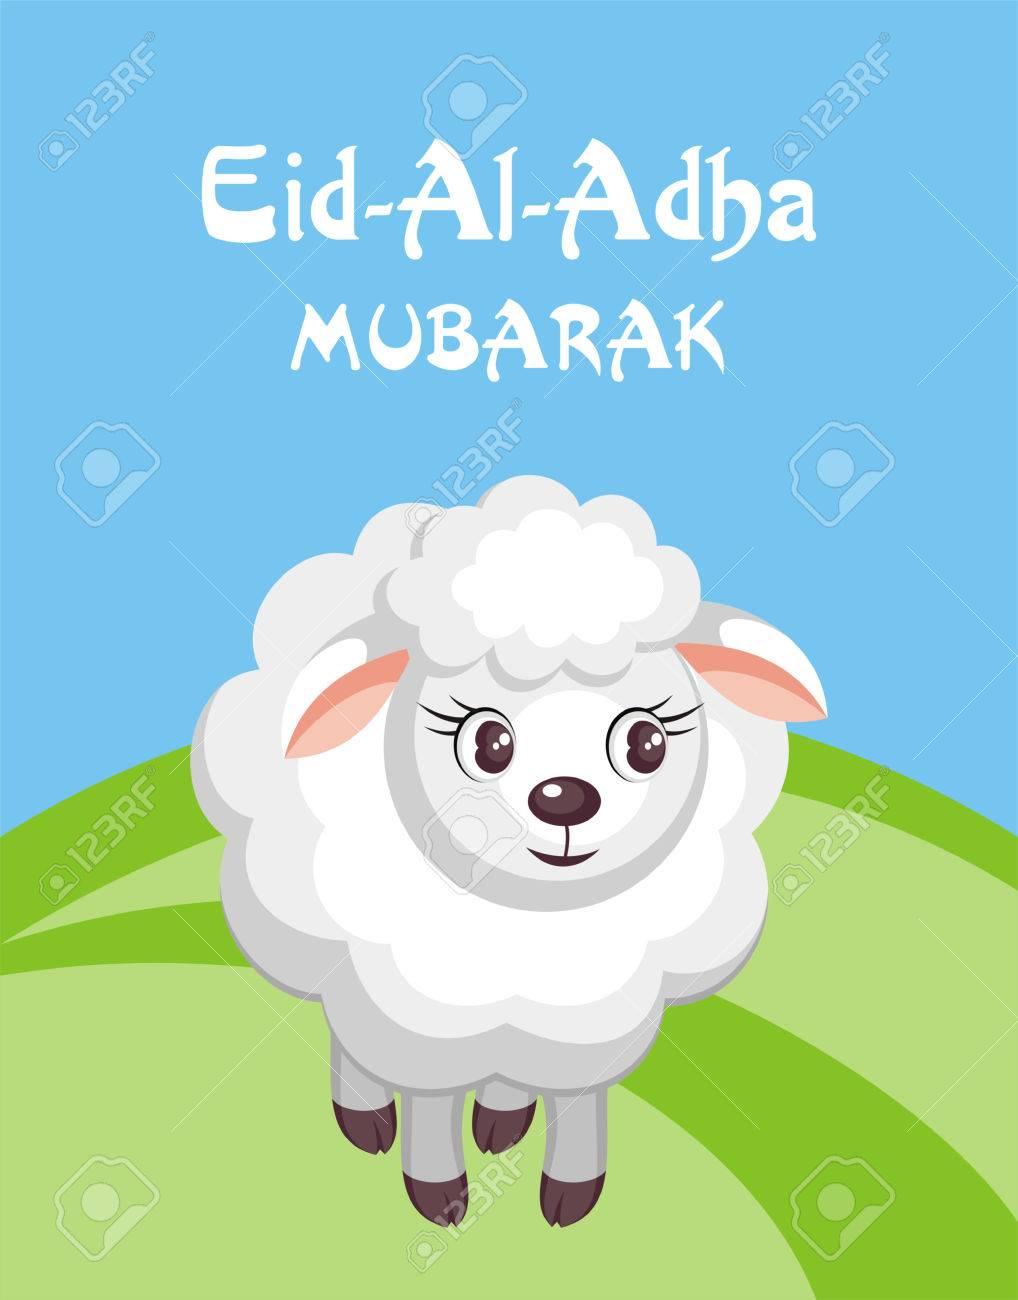 Eid Ul Adha Pictures Greetings Wallpaper Directory